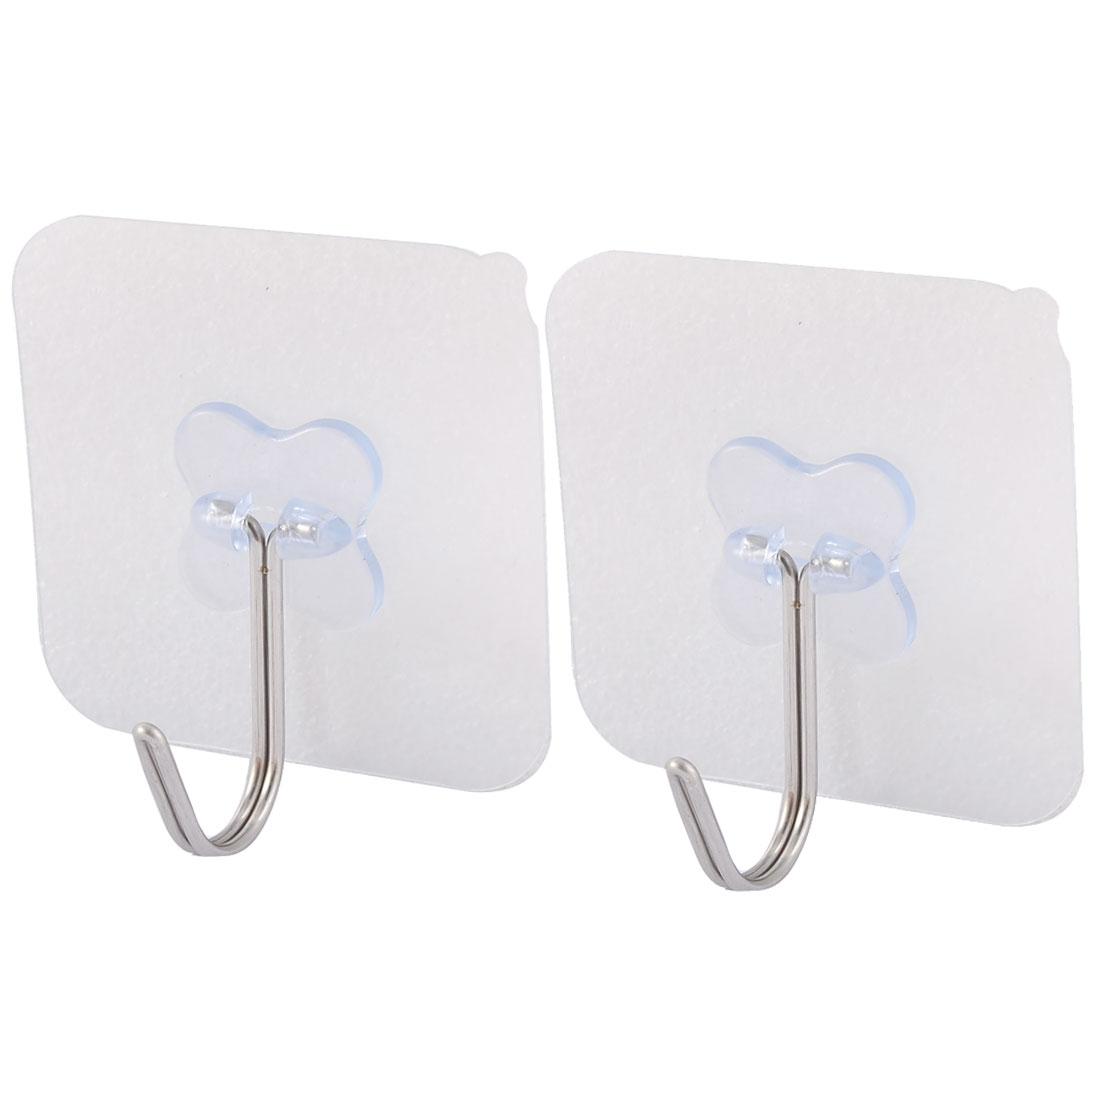 Wall Door No Scratch Towel Clothes Hanger Adhesive Seamless Hook Clear Blue 2pcs